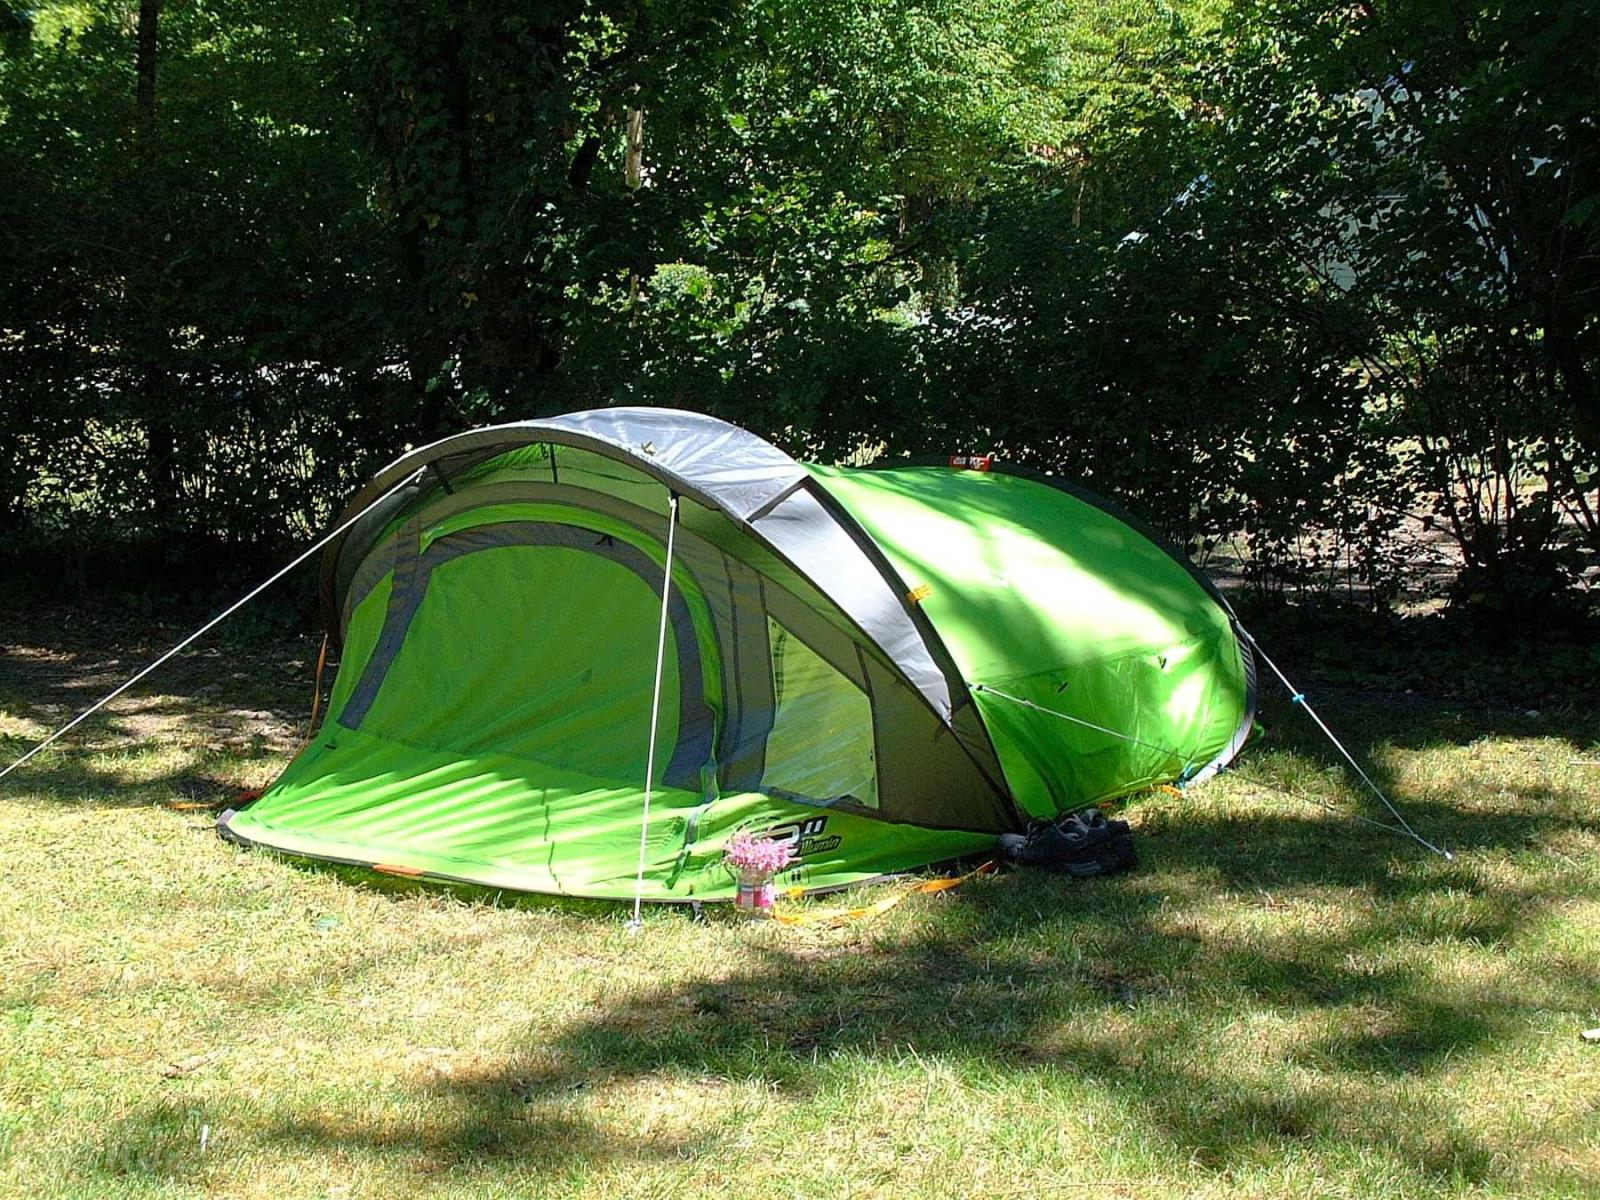 Emplacement - Forfait Halte Cyclo/Rando - Camping Le Bois Dinot